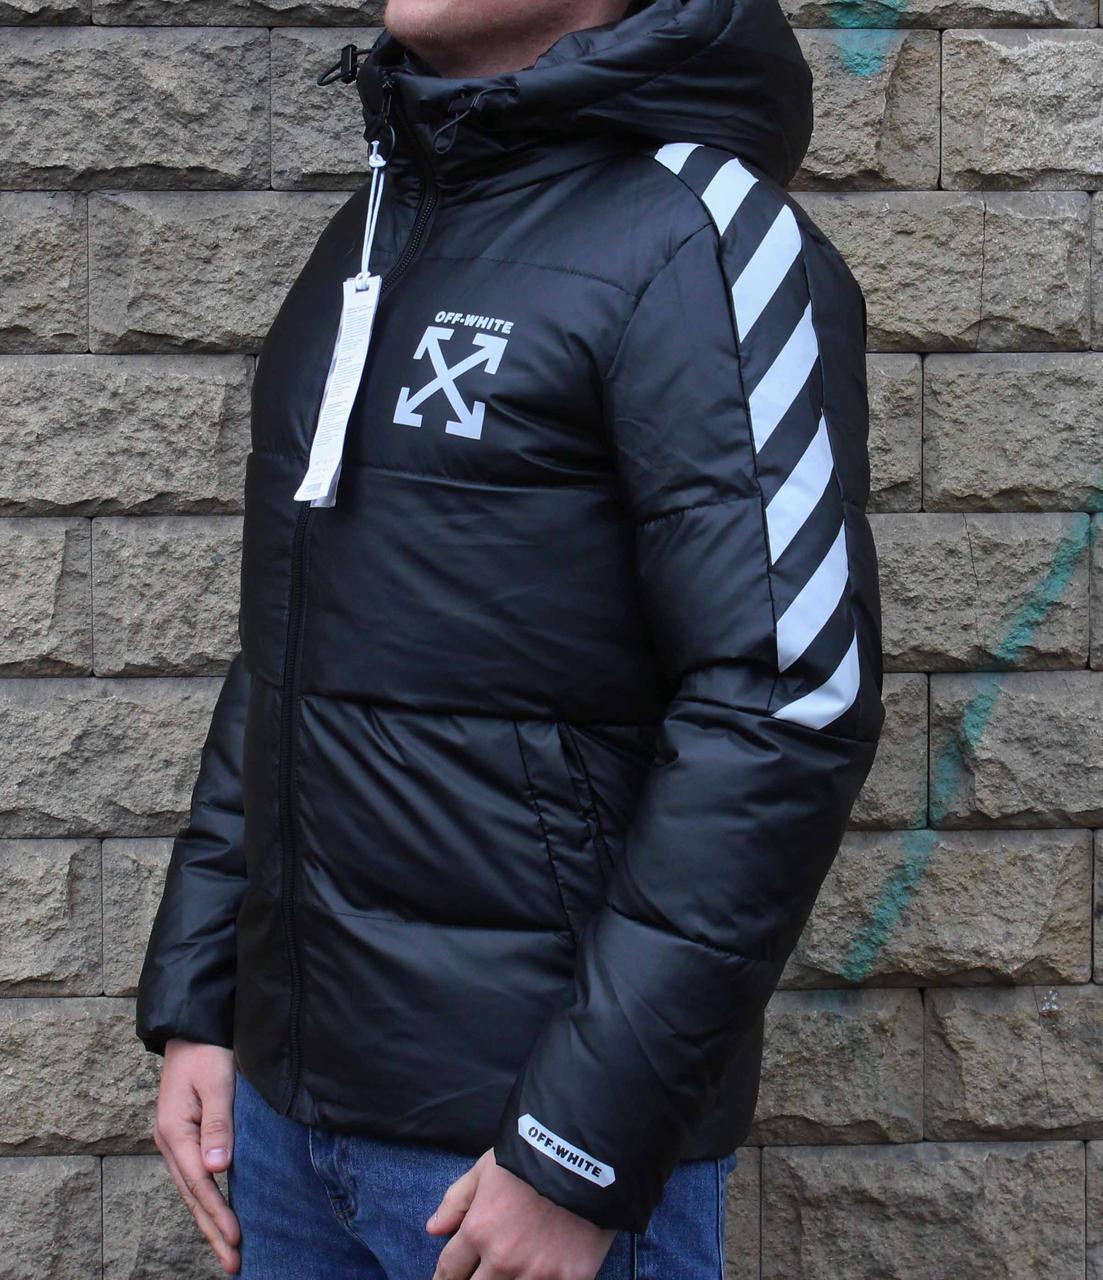 Зимняя короткая черная куртка в стиле Off-White 52 размер